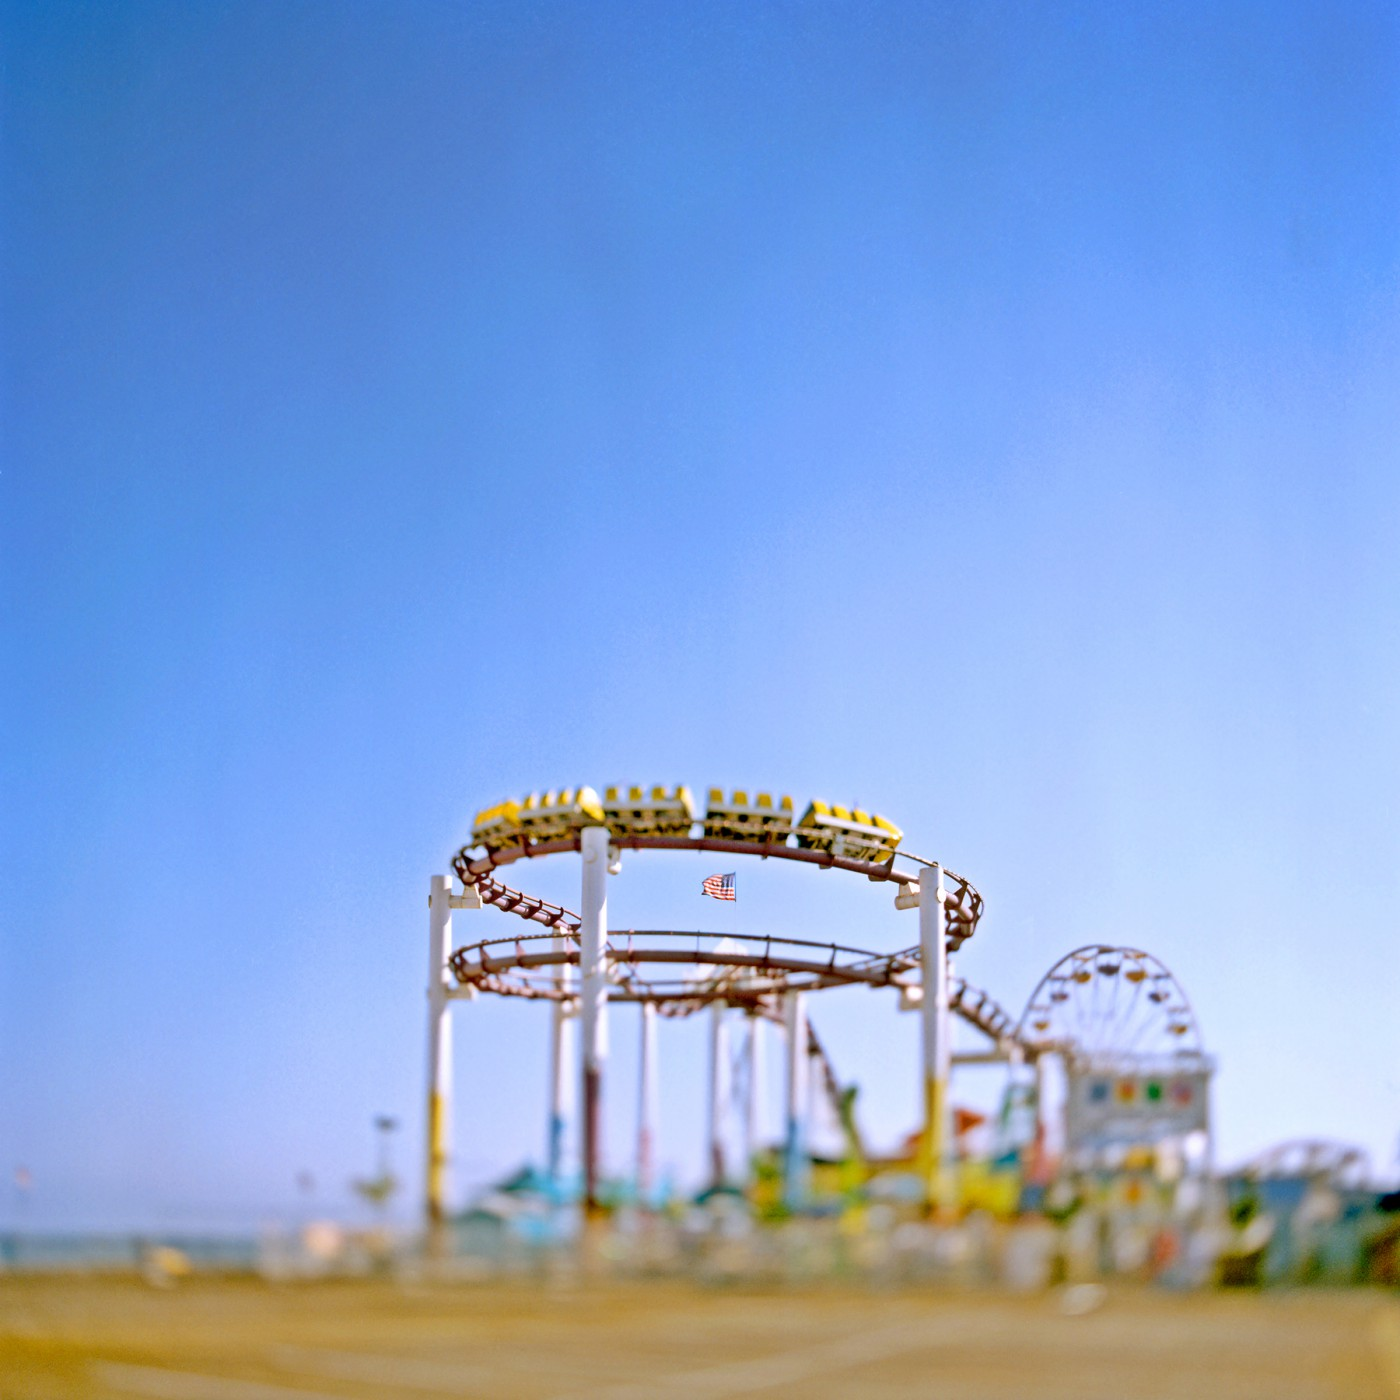 Toni Hafkenscheid, </span><span><em>Roller coaster, Santa Monica, CA, 2004</em>